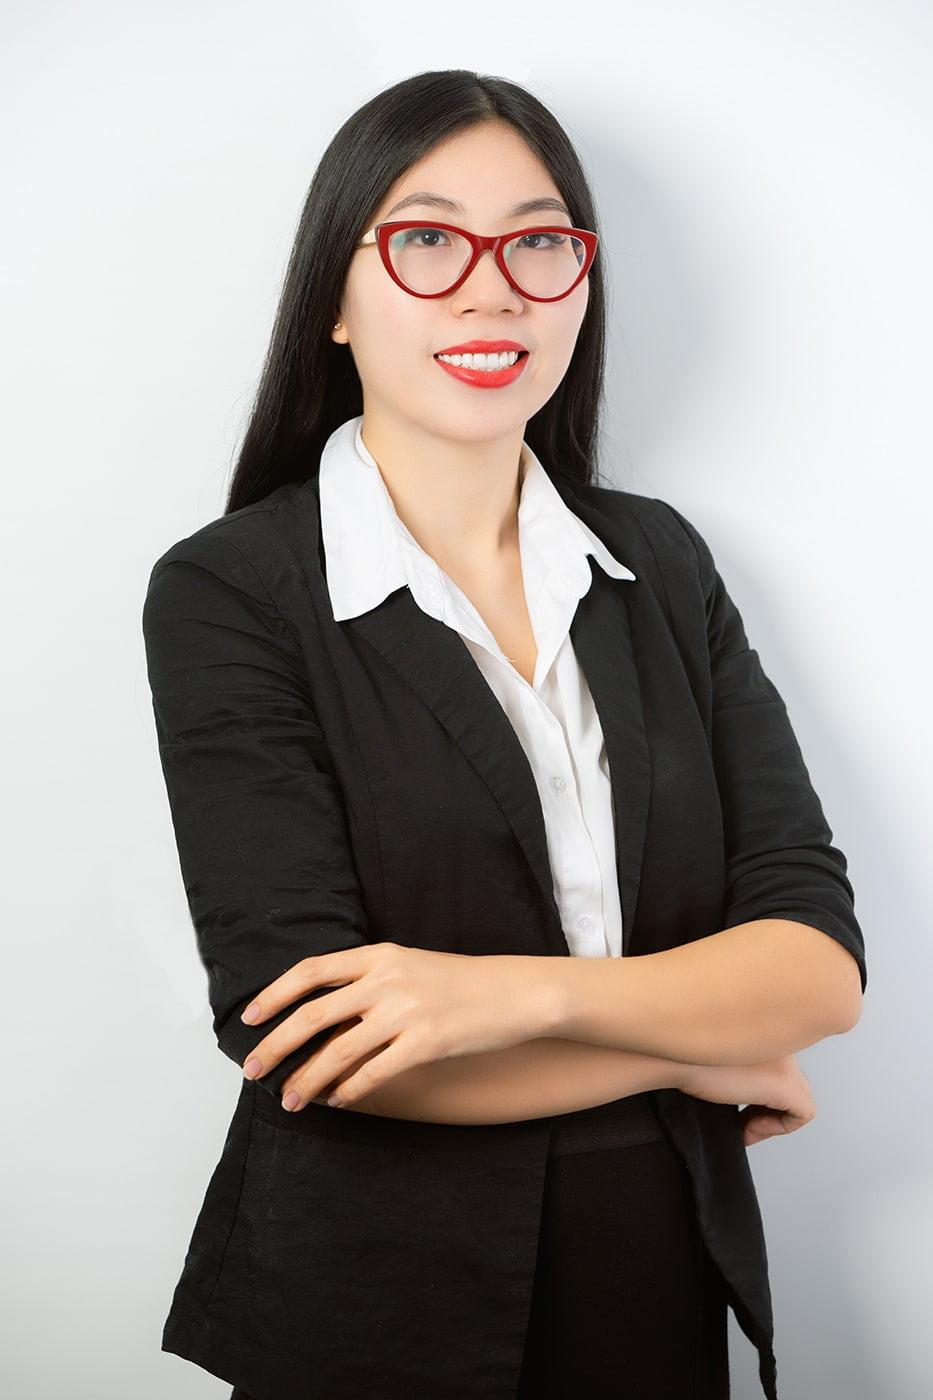 Profile cong ty 24 - Album chụp ảnh profile công ty Luật Dzungsrt Law - HThao Studio